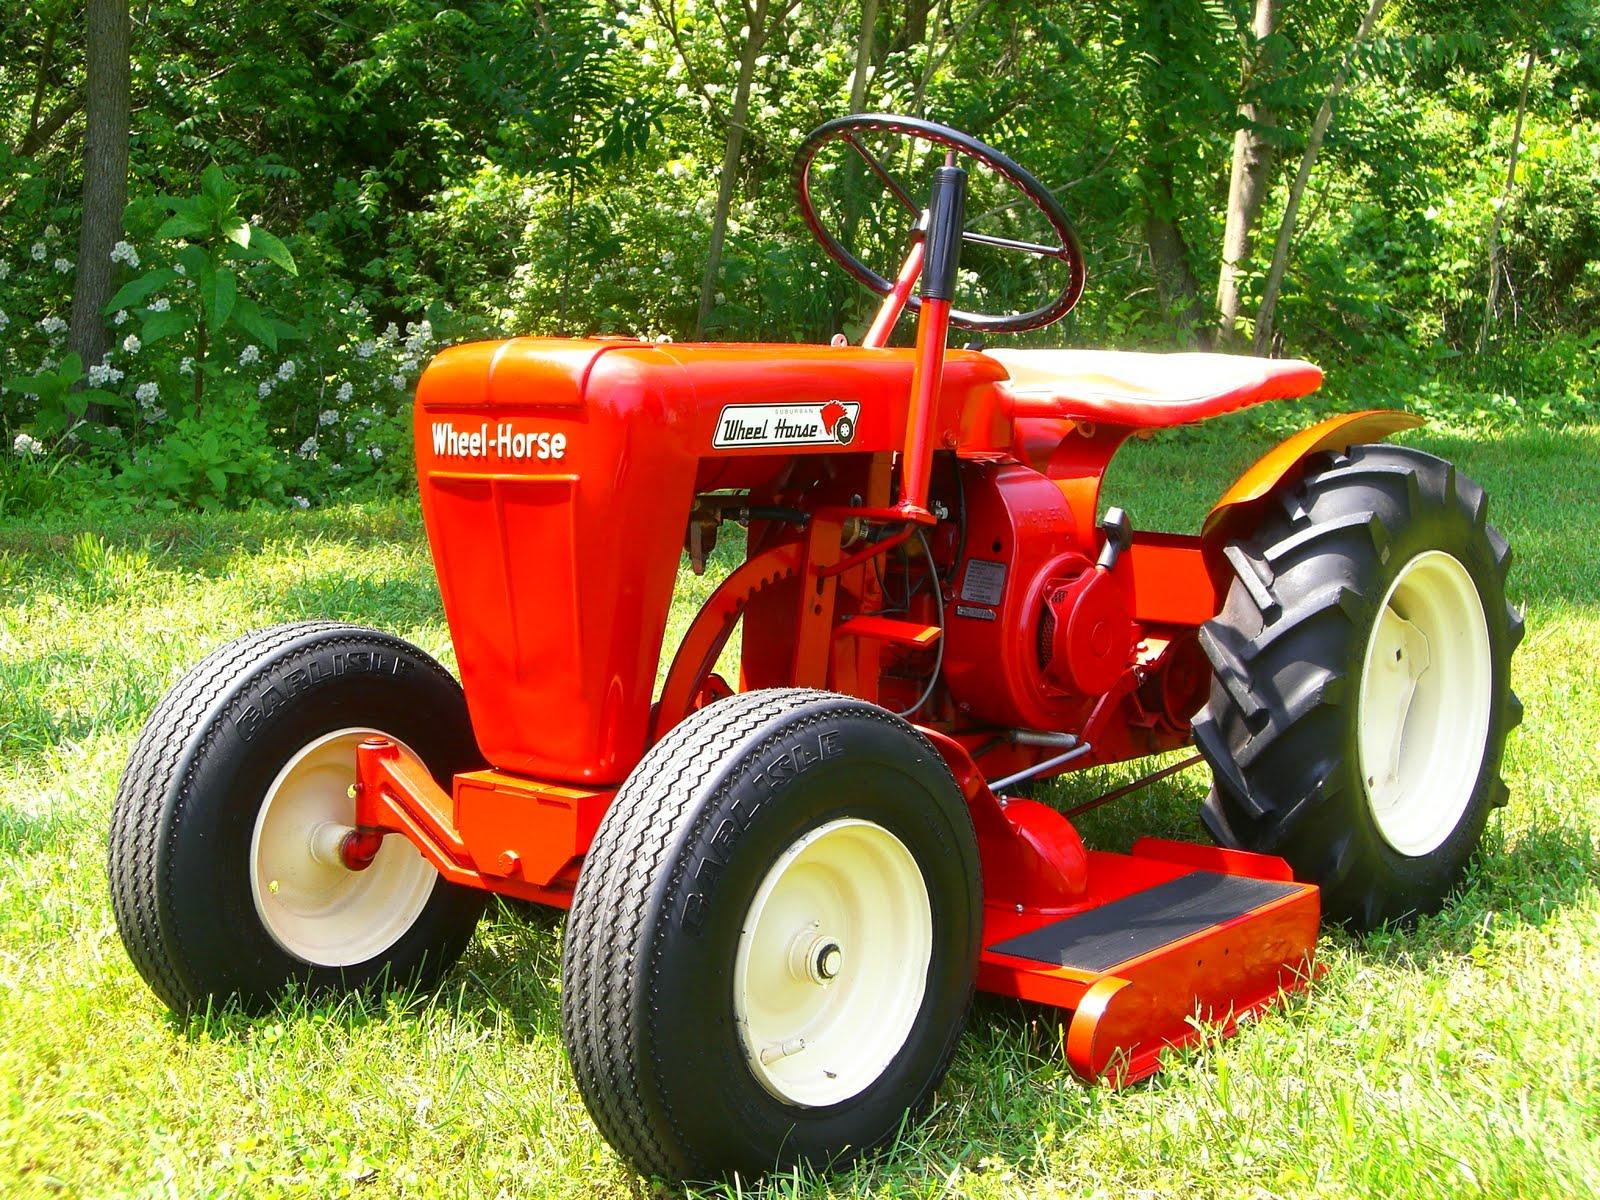 wiring diagram wheel horse lawn tractor scion xb tractors bing images